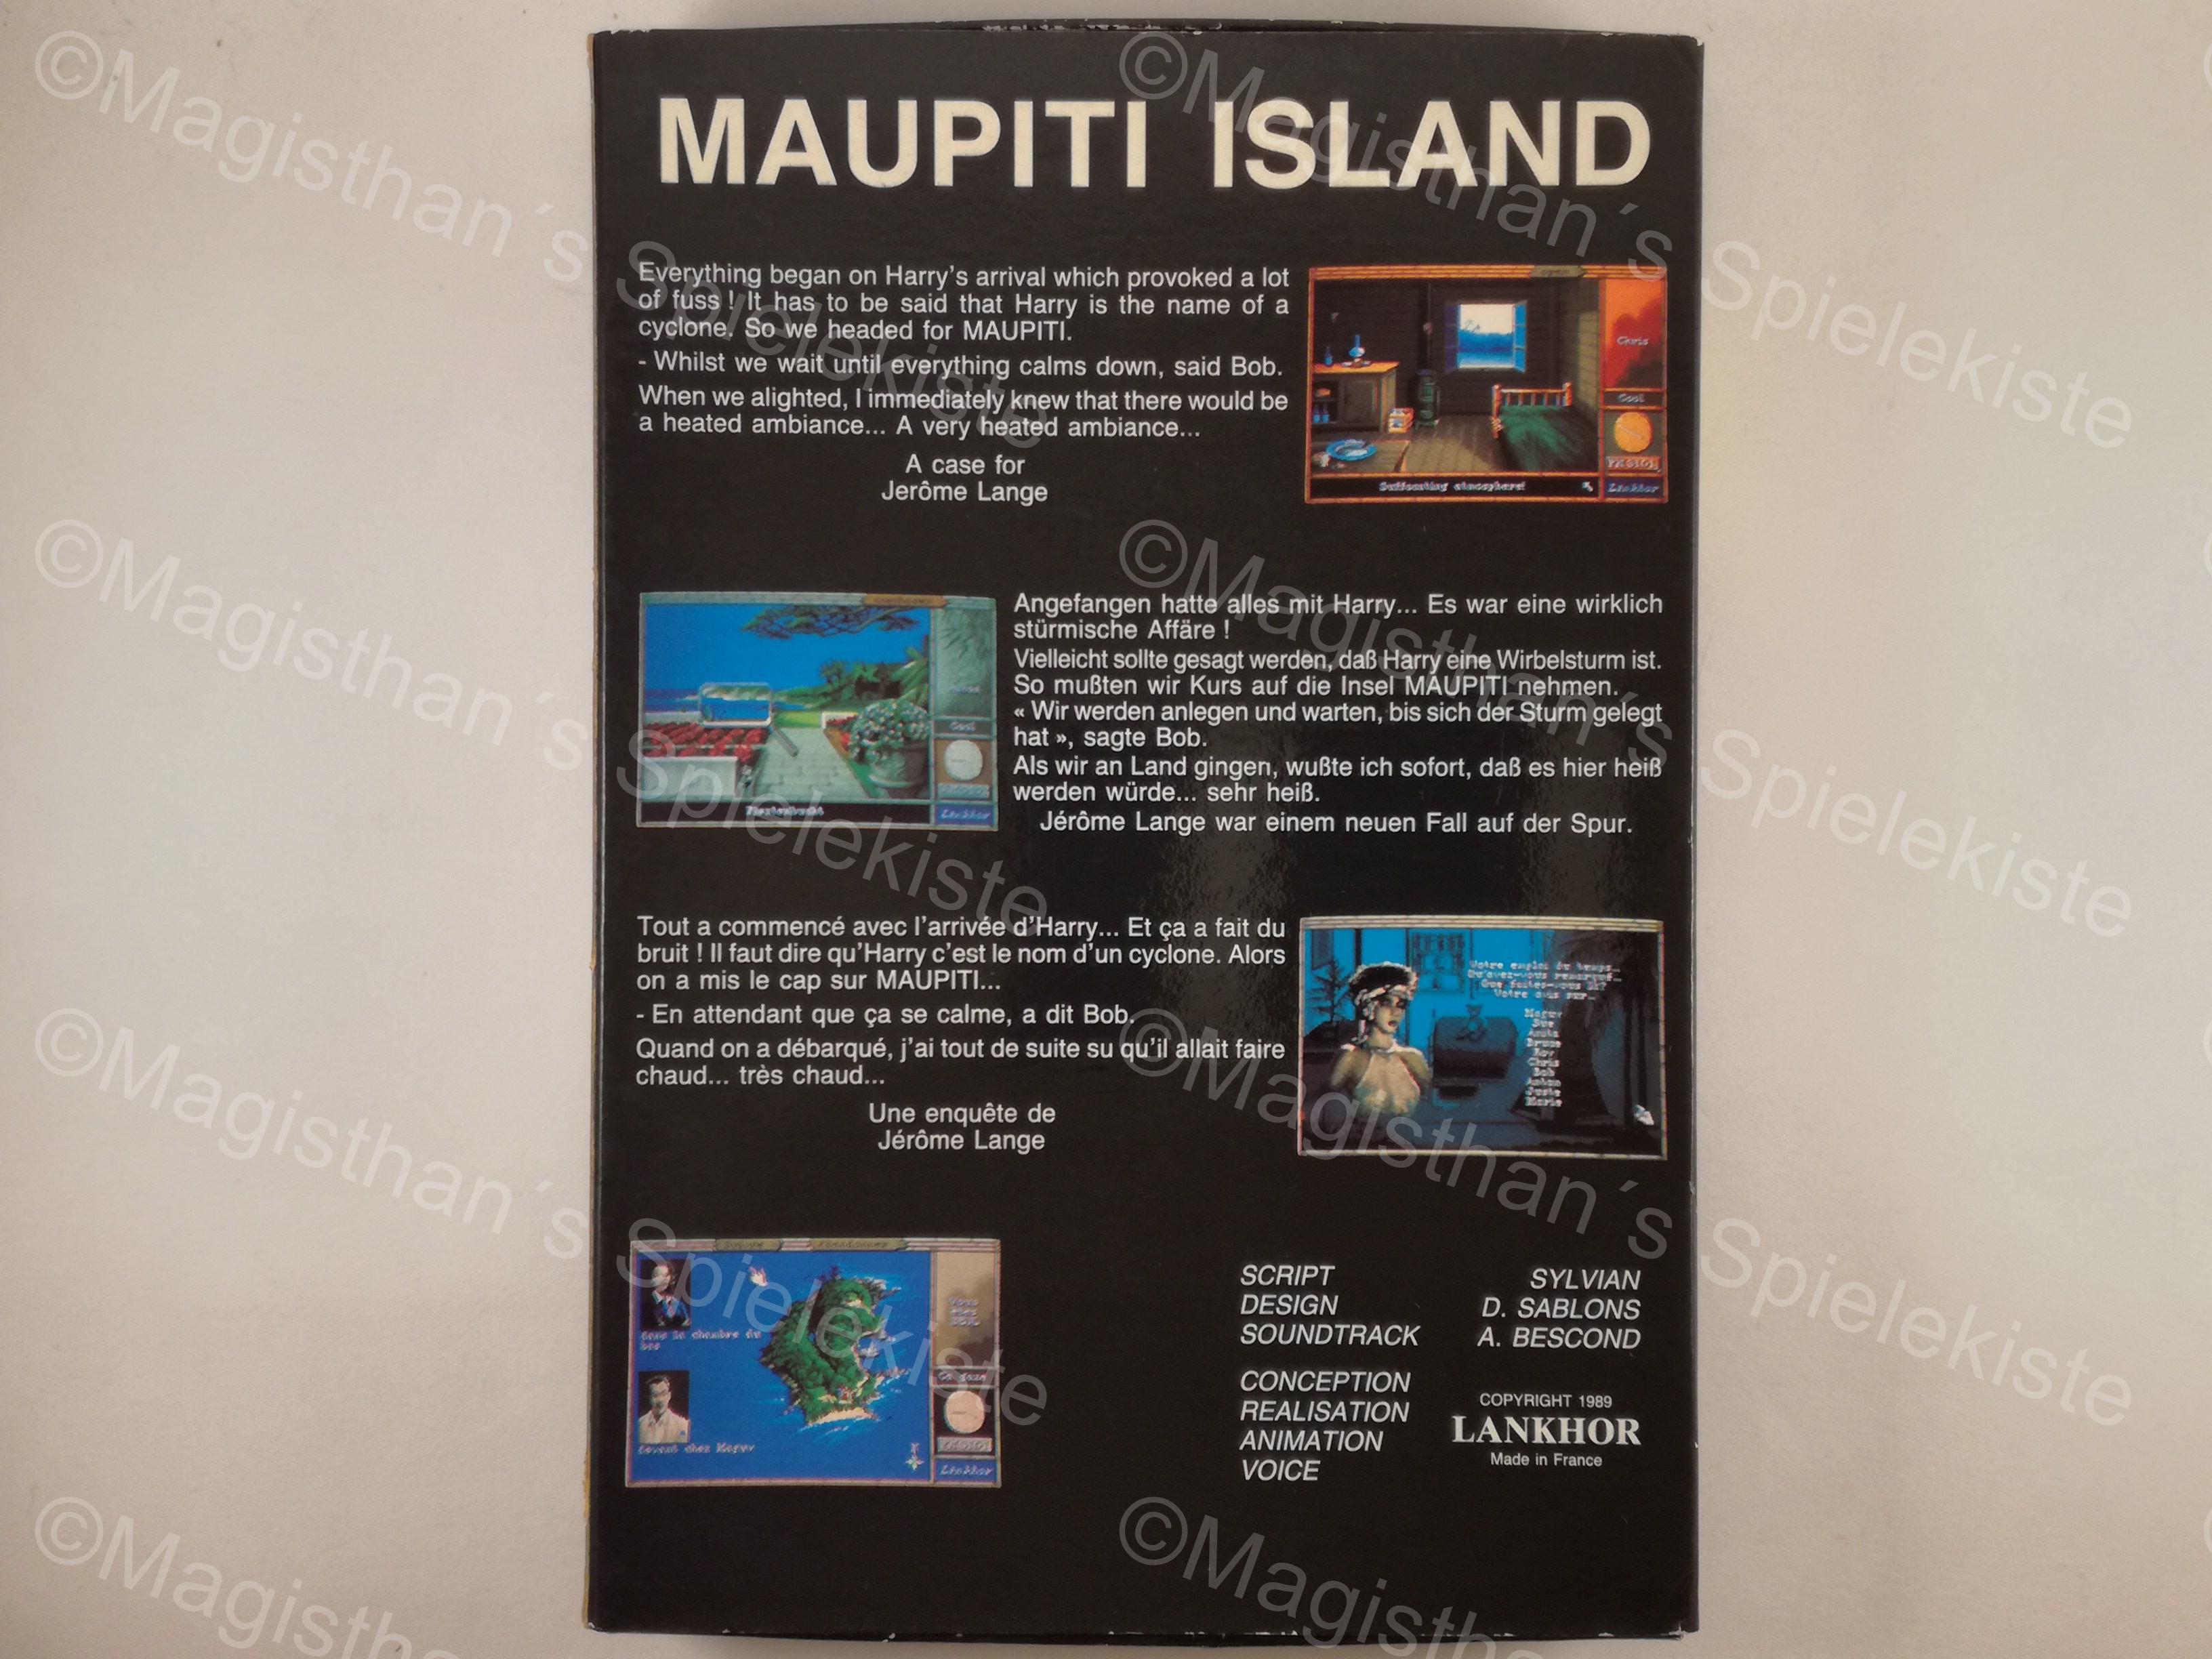 MaupitiIsland1b_back.jpg